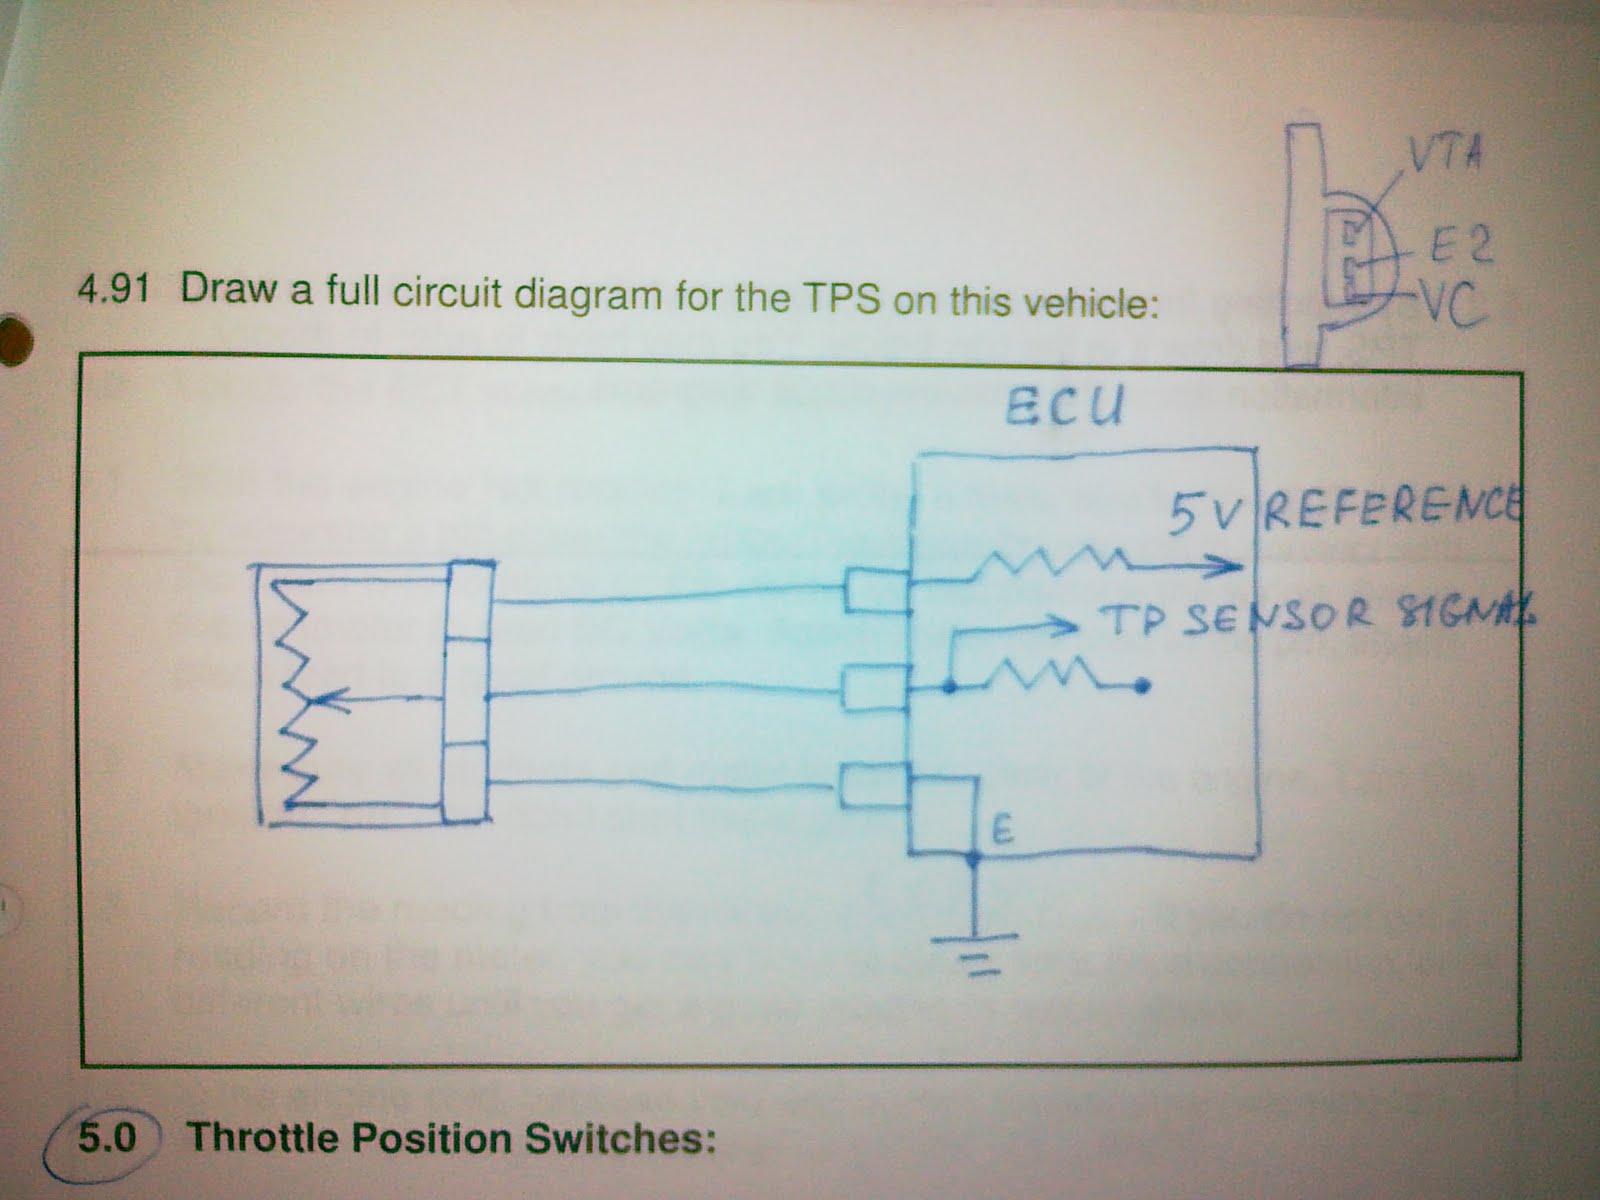 TTEC4826: TTEC4826 INPUT SENSORS AND ACTUATORS ON-VEHICLE